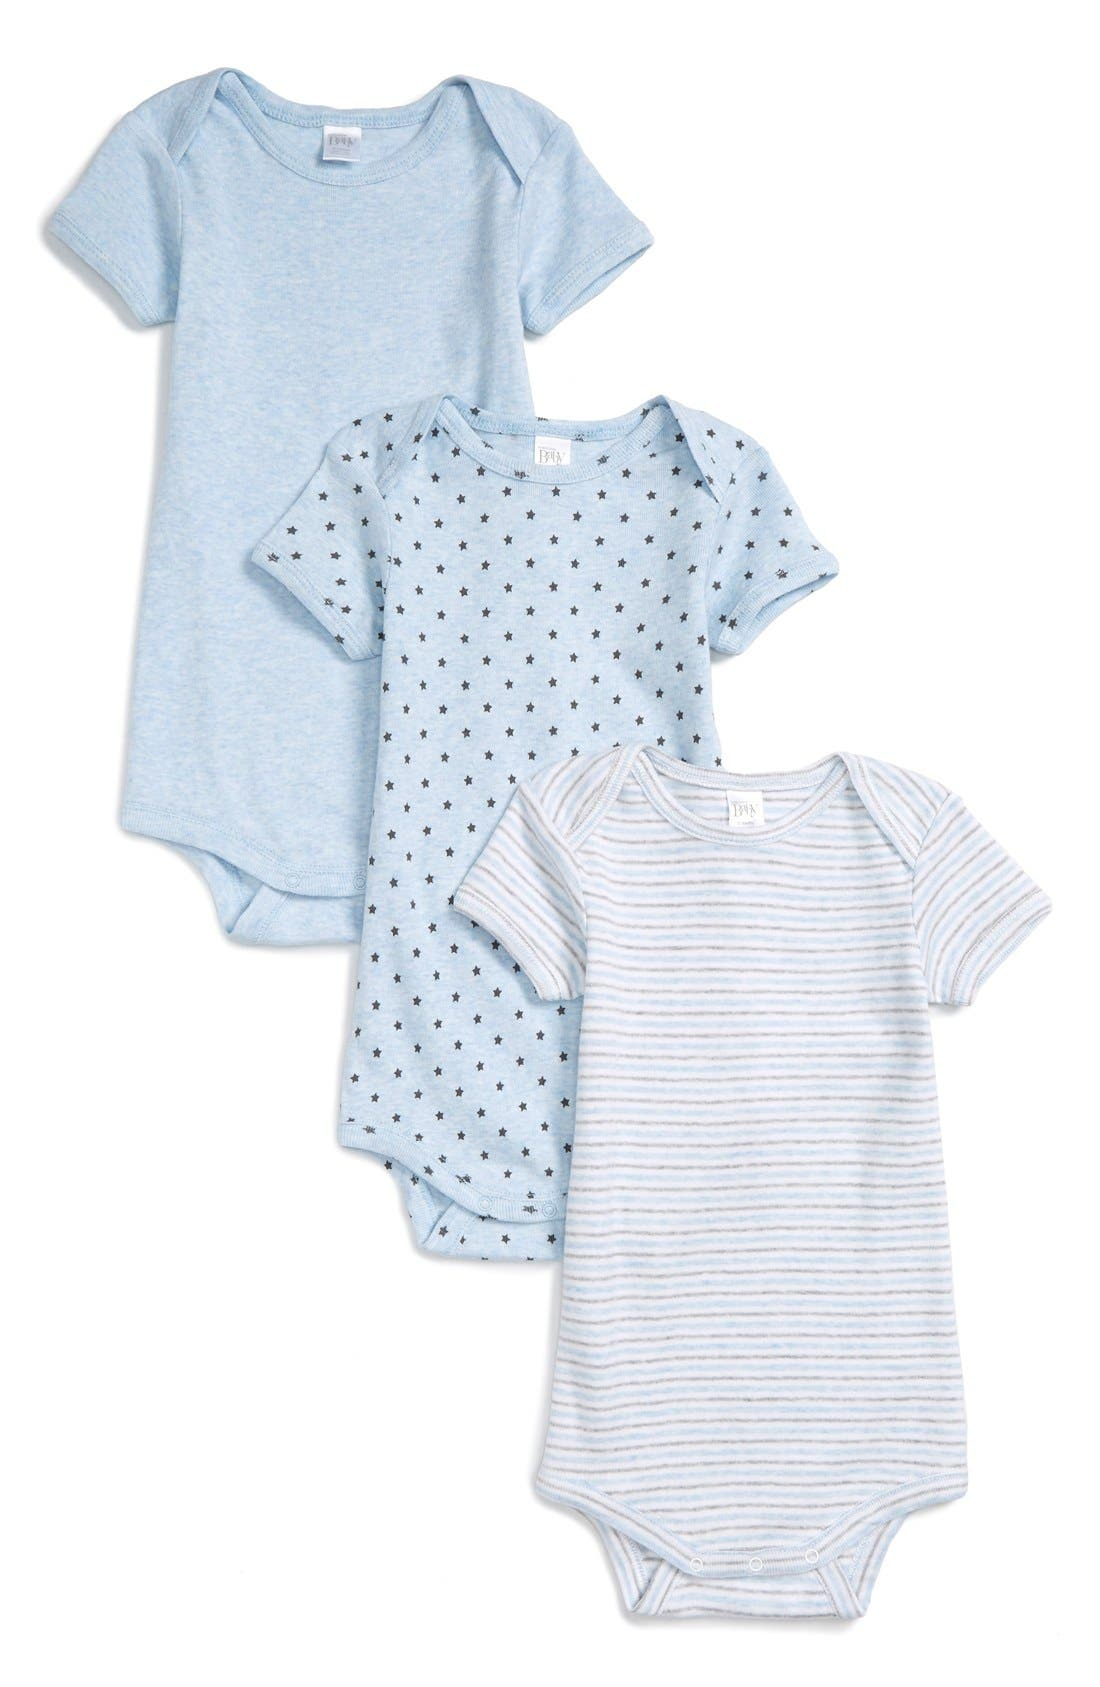 NORDSTROM BABY 3-Pack Bodysuits